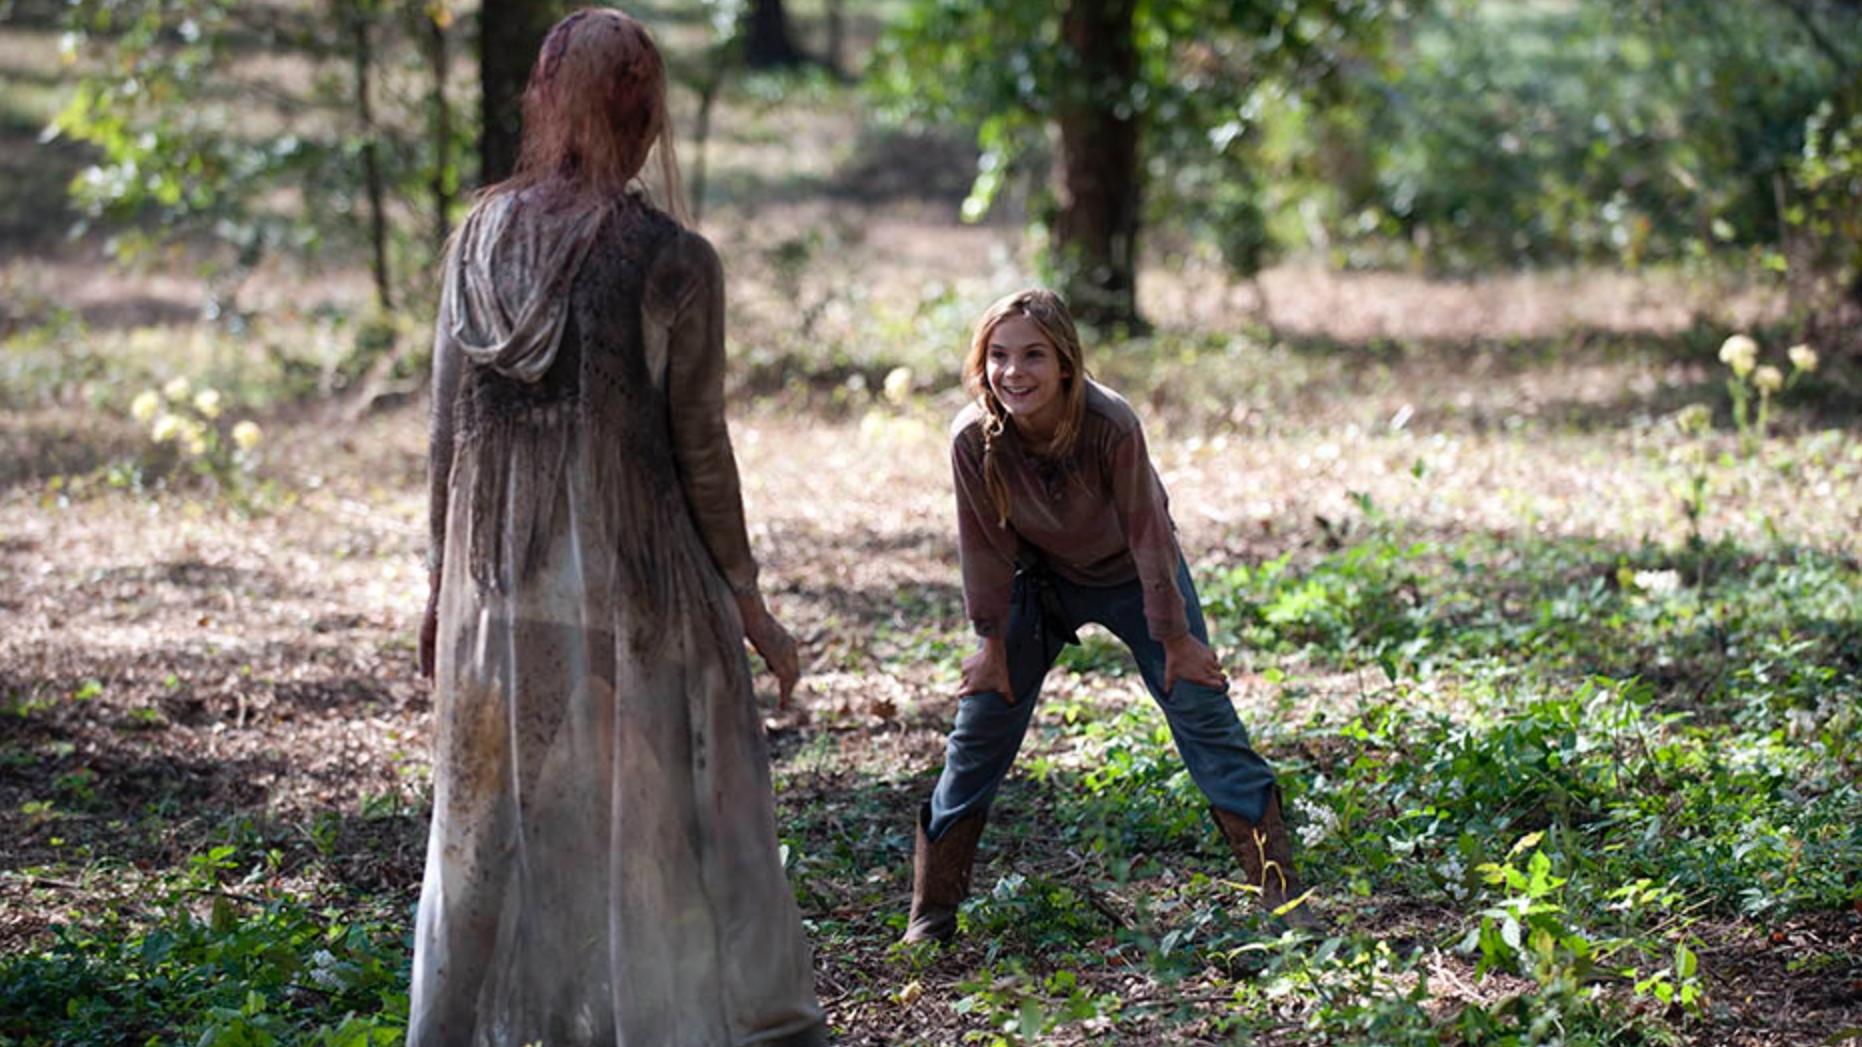 The Walking Dead Fonds d'écran, Arrières-plan   1862x1047   ID ...